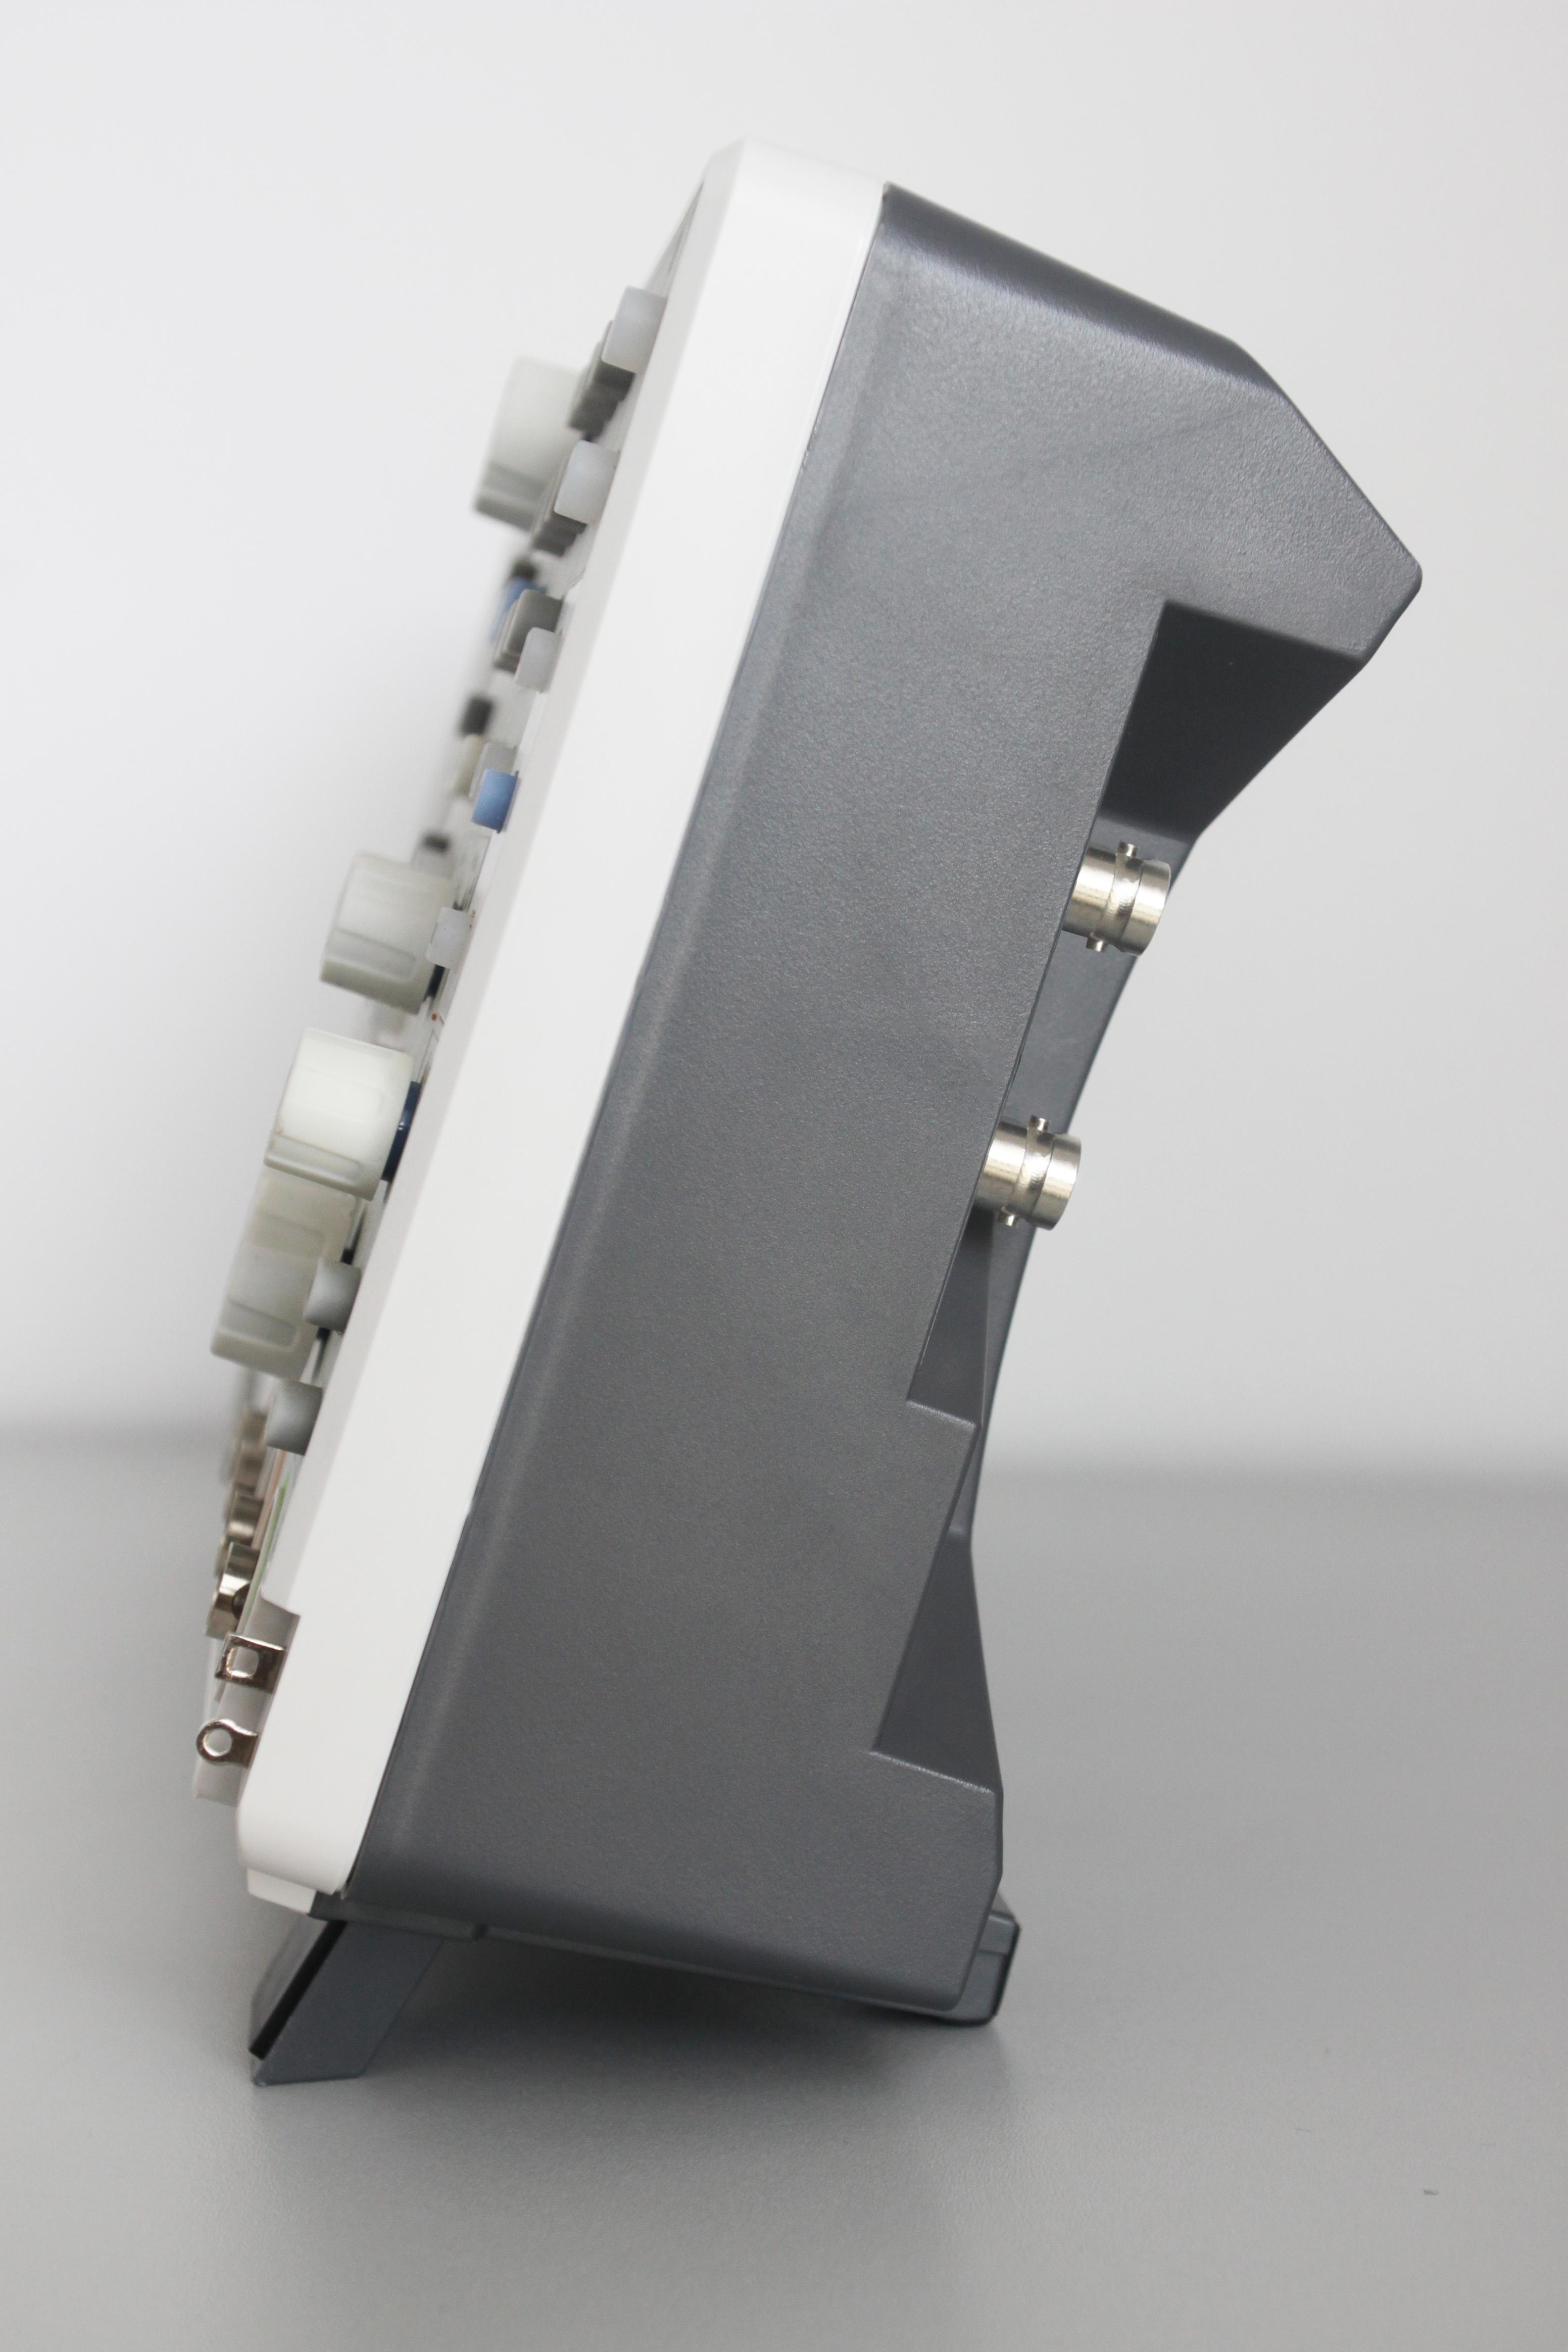 «PeakTech® P 1370» 60 MHz / 4 CH, 1 GS/s touchscreen oscilloscope